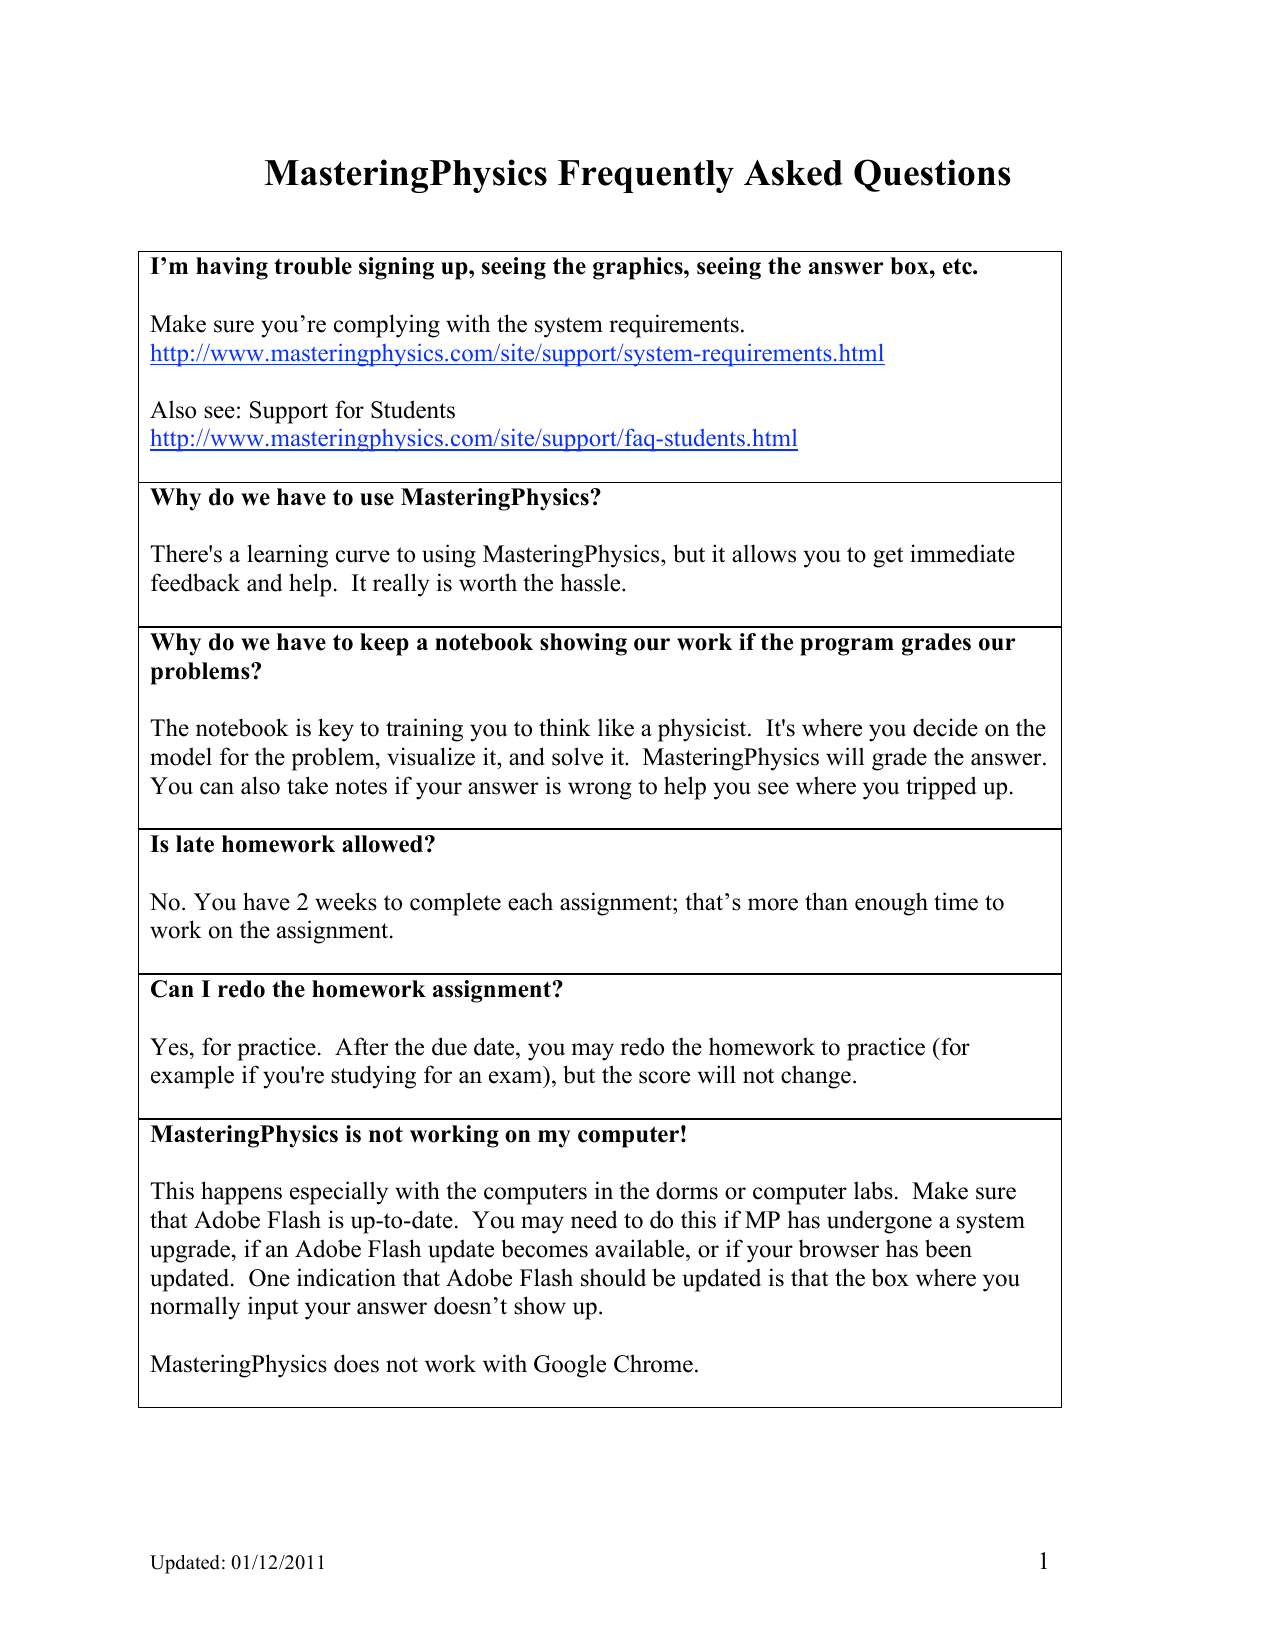 company essay samples expository